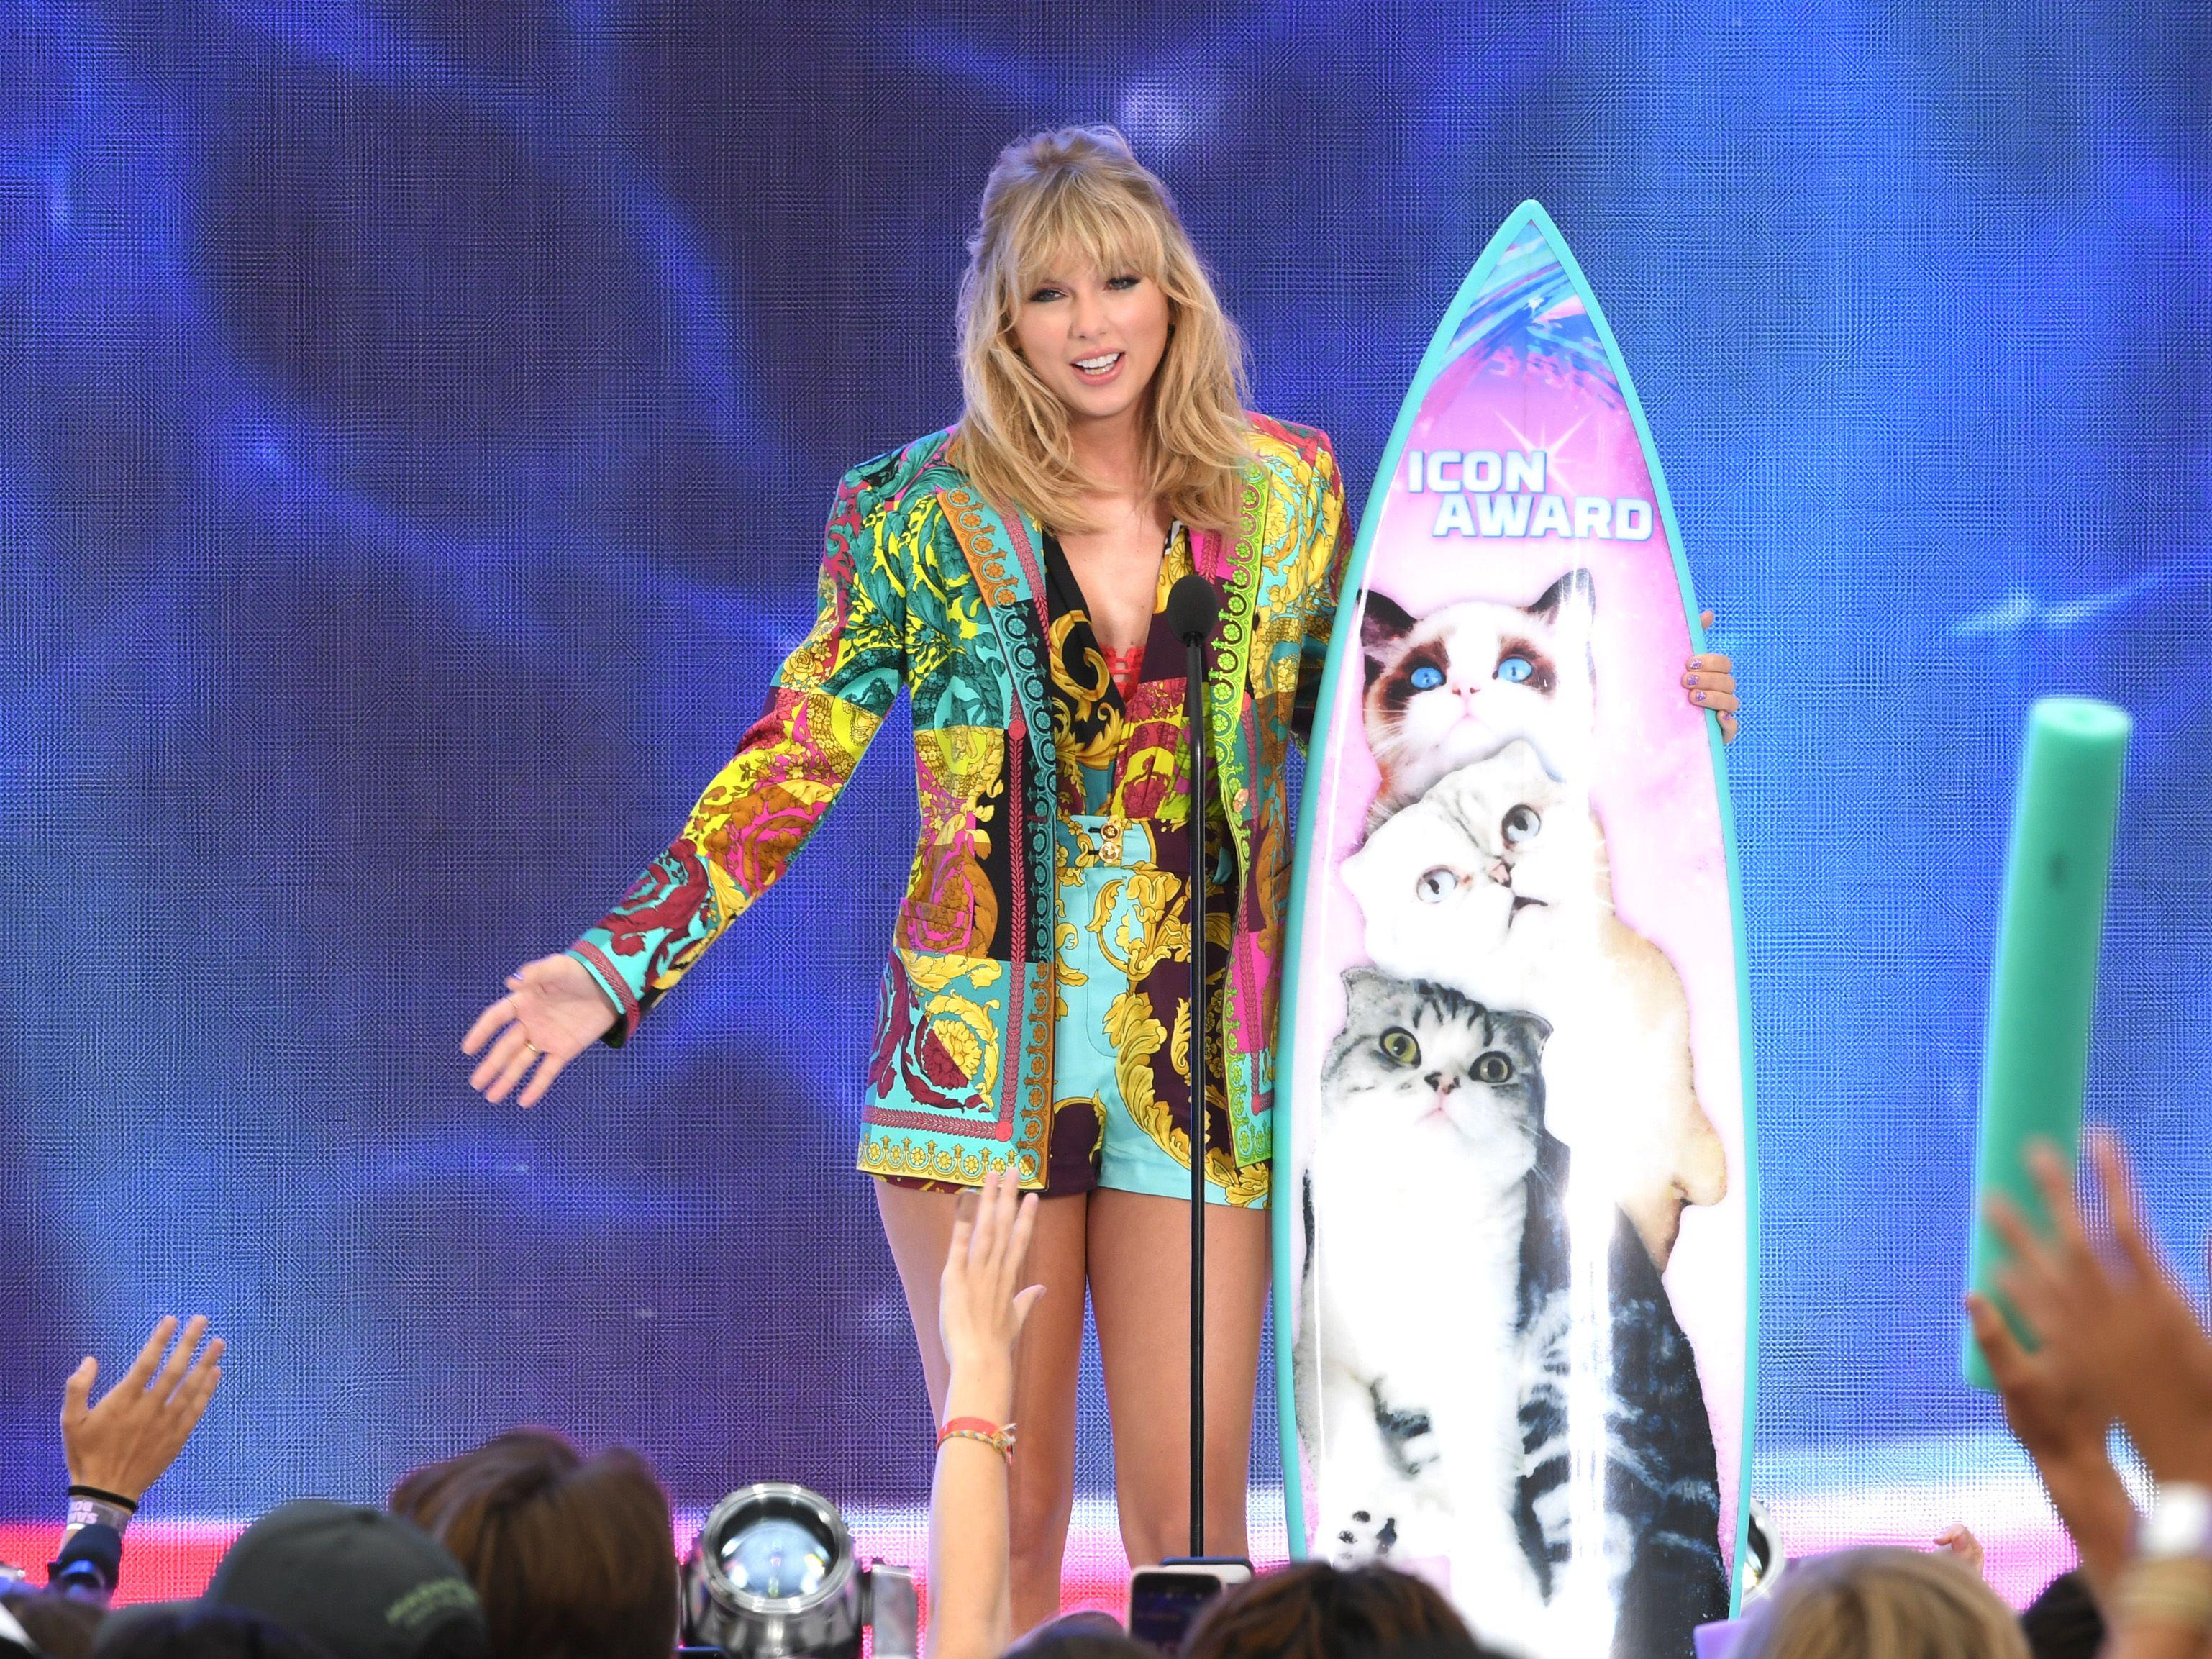 Som er dating Taylor Swift 2013